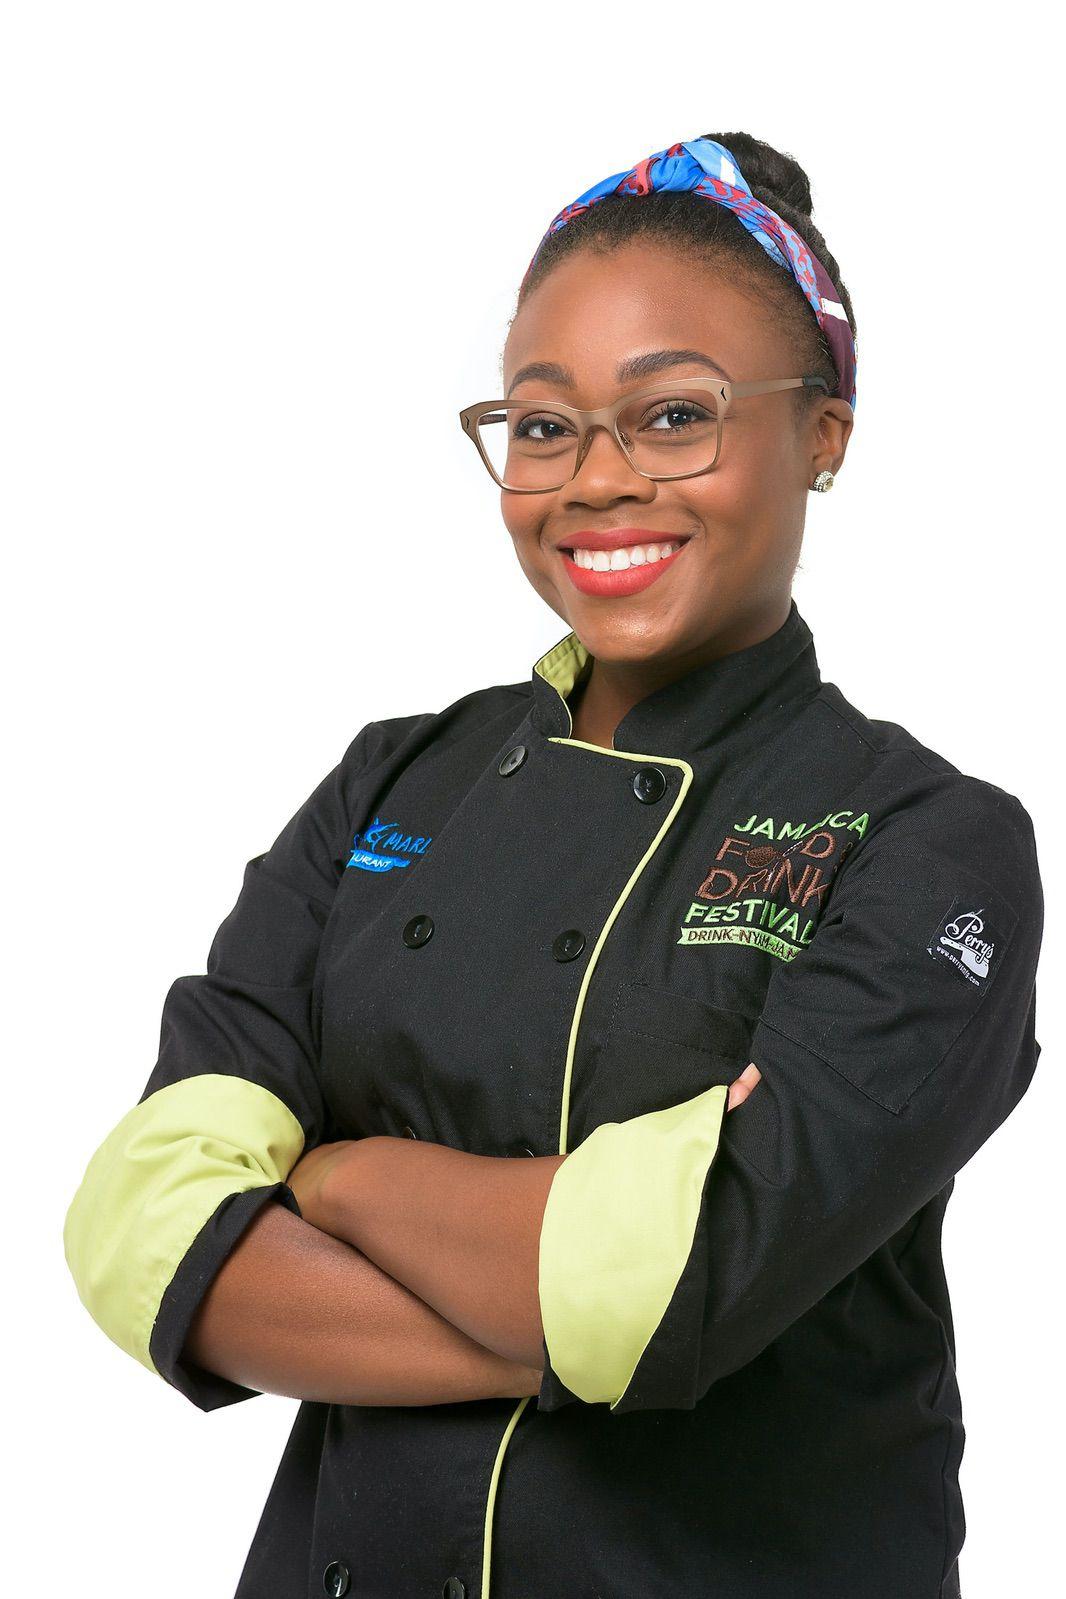 Jamaica Food & Drink Festival Chef Portraits Shoot 2 Edits-6503.jpg